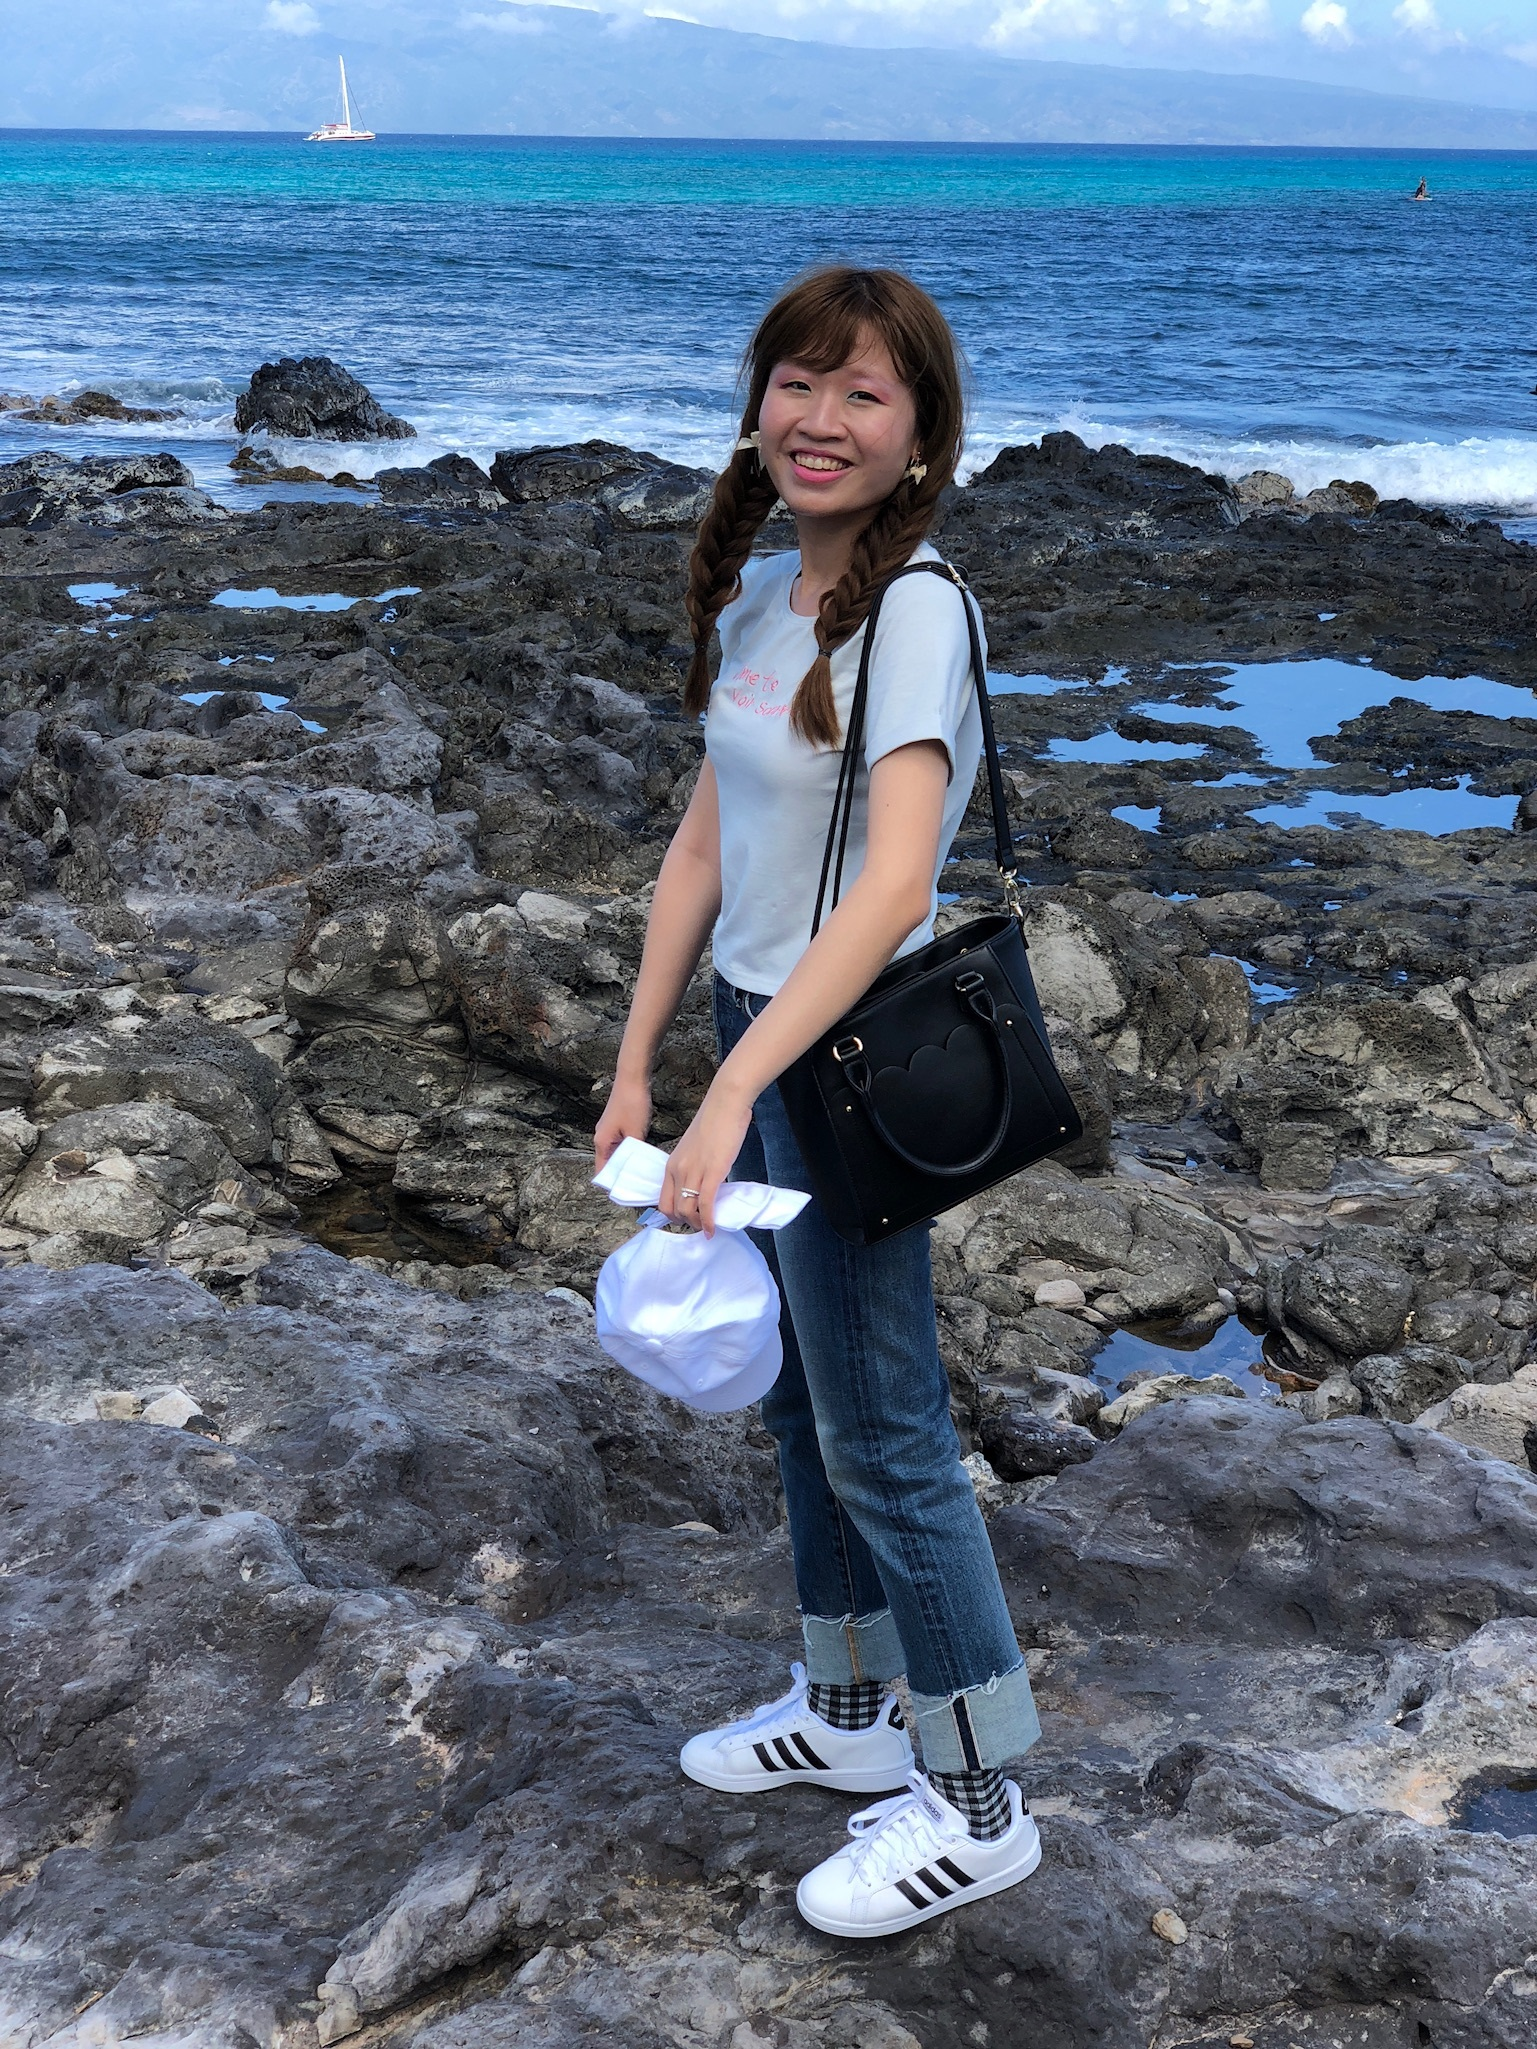 At Napili Beach. T-shirt: dazzlin; jeans: mercuryduo; socks: tutuanna; shoes: Adidas; hat: WC; bag: LODISPOTTO; earrings: LODISPOTTO.